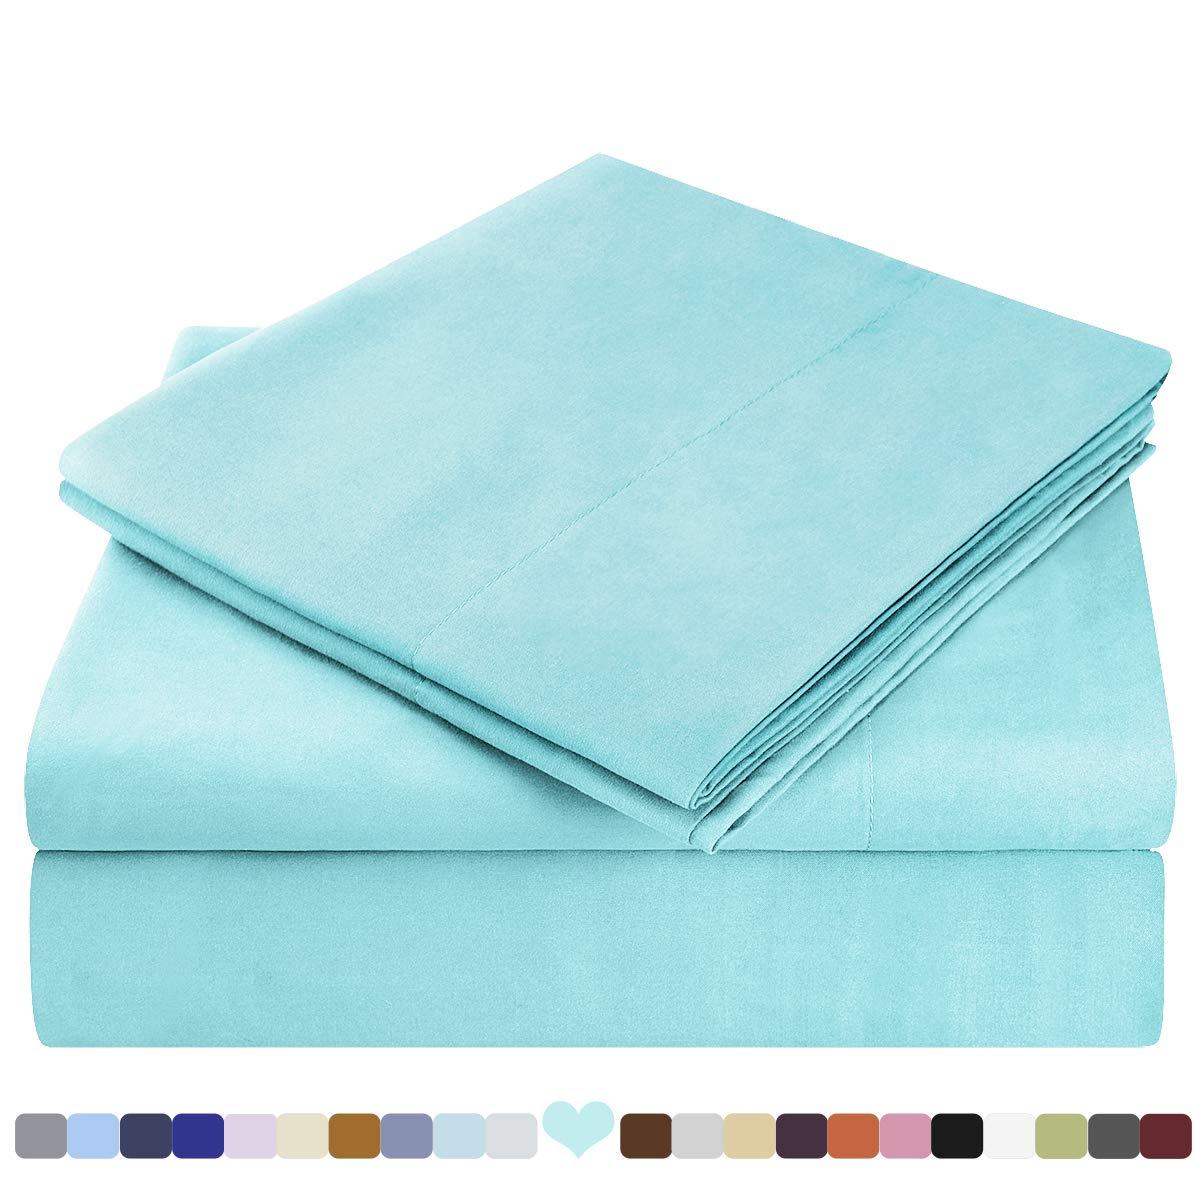 HOMEIDEAS Bed Sheets Set Extra Soft Brushed Microfiber 1800 Bedding Sheets - Deep Pocket, Wrinkle & Fade Free - 4 Piece(Queen,Aqua Blue)